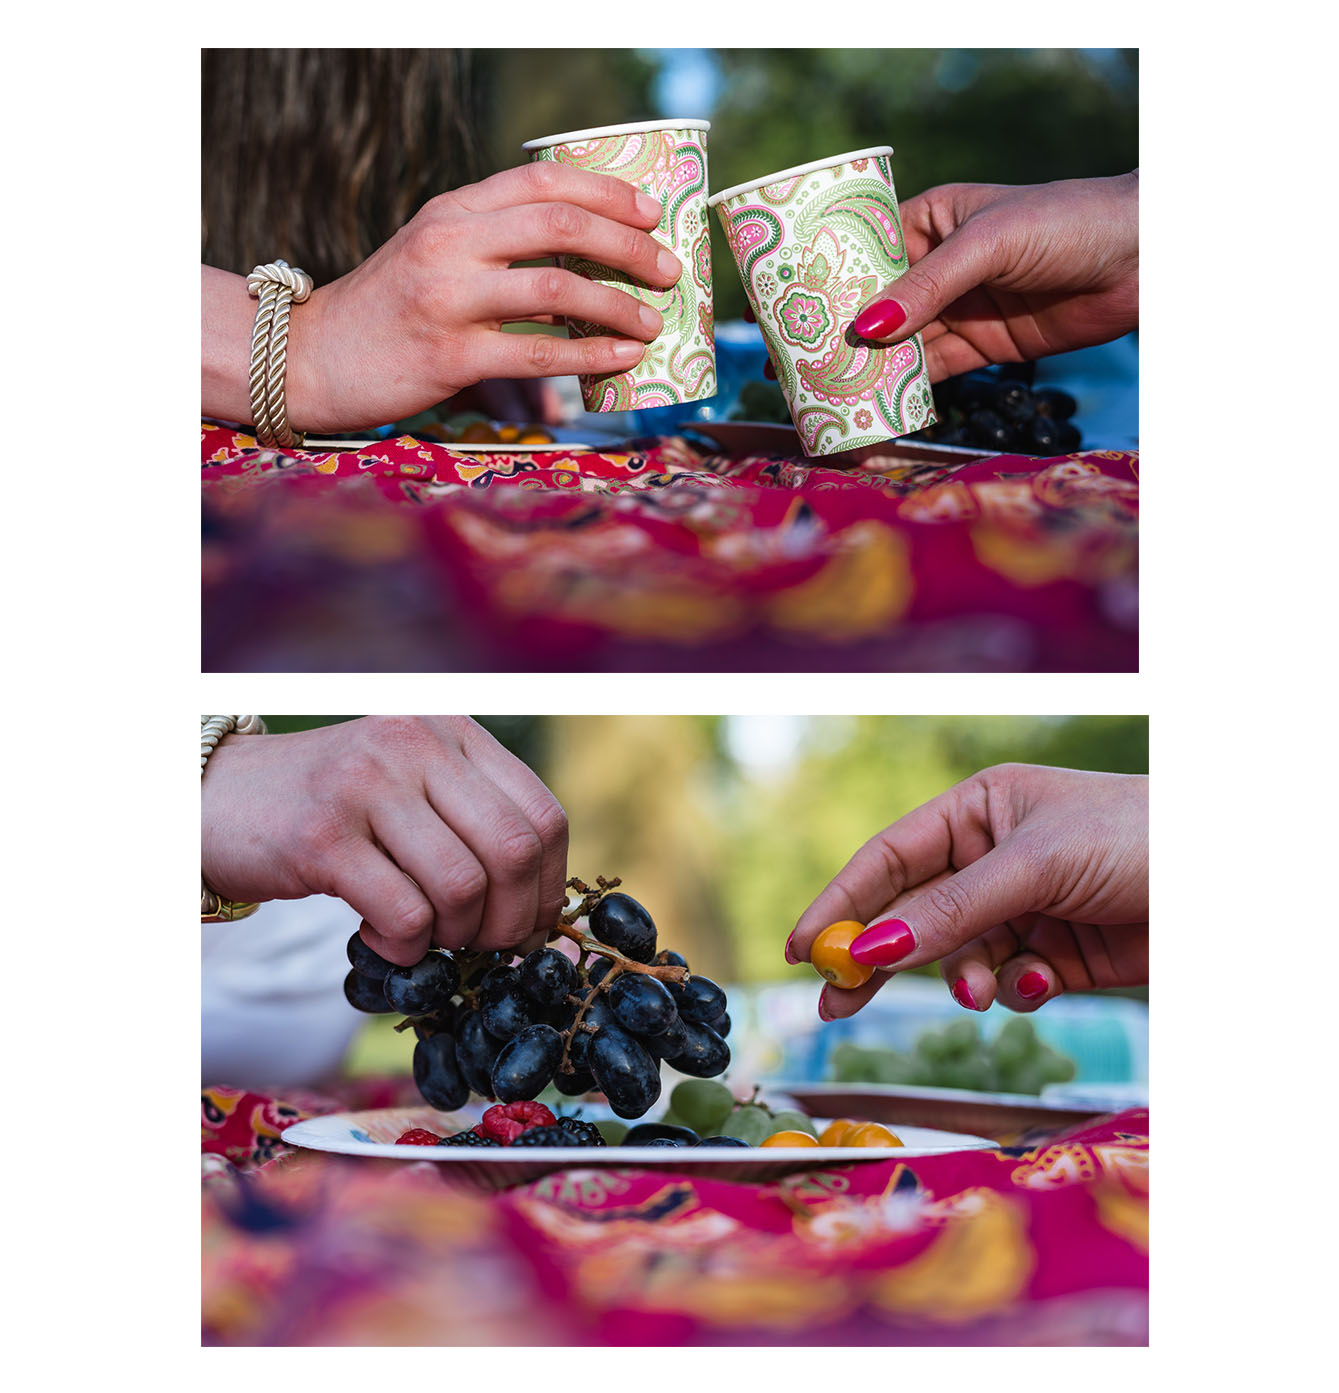 Spontanes Picknick im Grünen